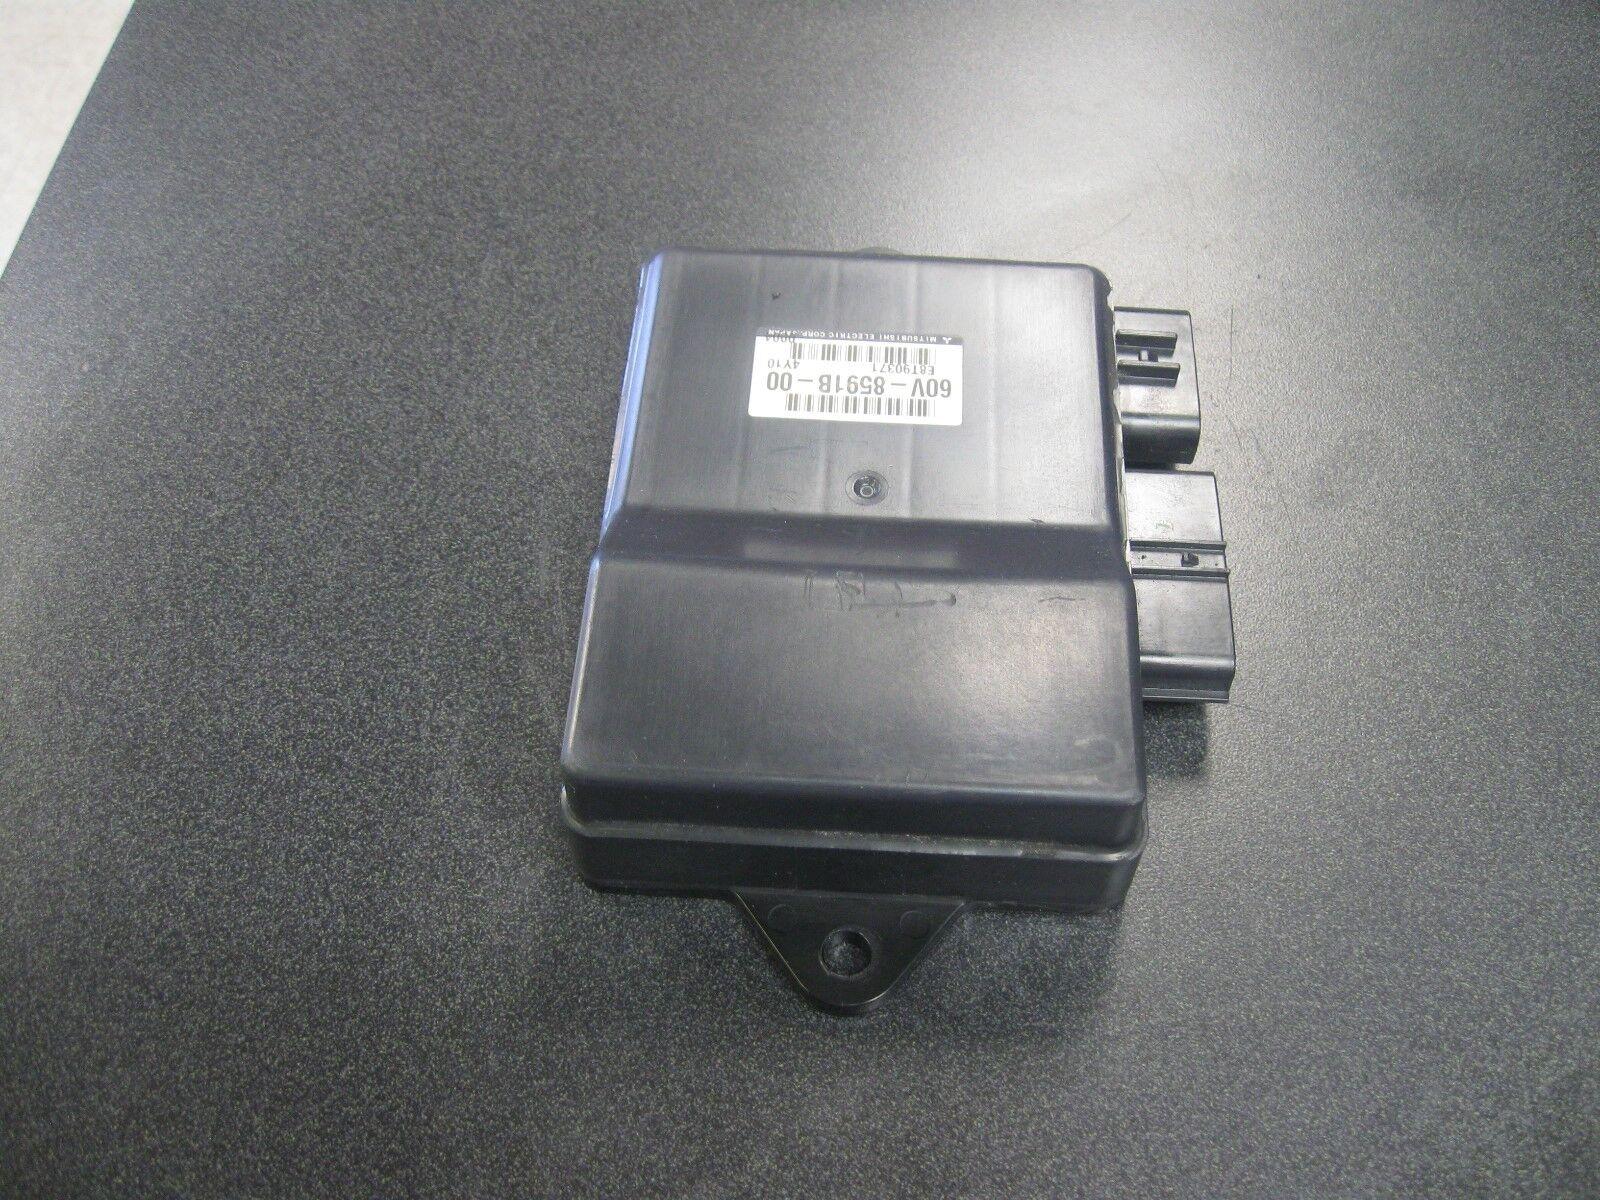 Yamaha Außenborder Injektor Injektor Außenborder Fahrer Assy 60V-8591B-00-00 57f36b